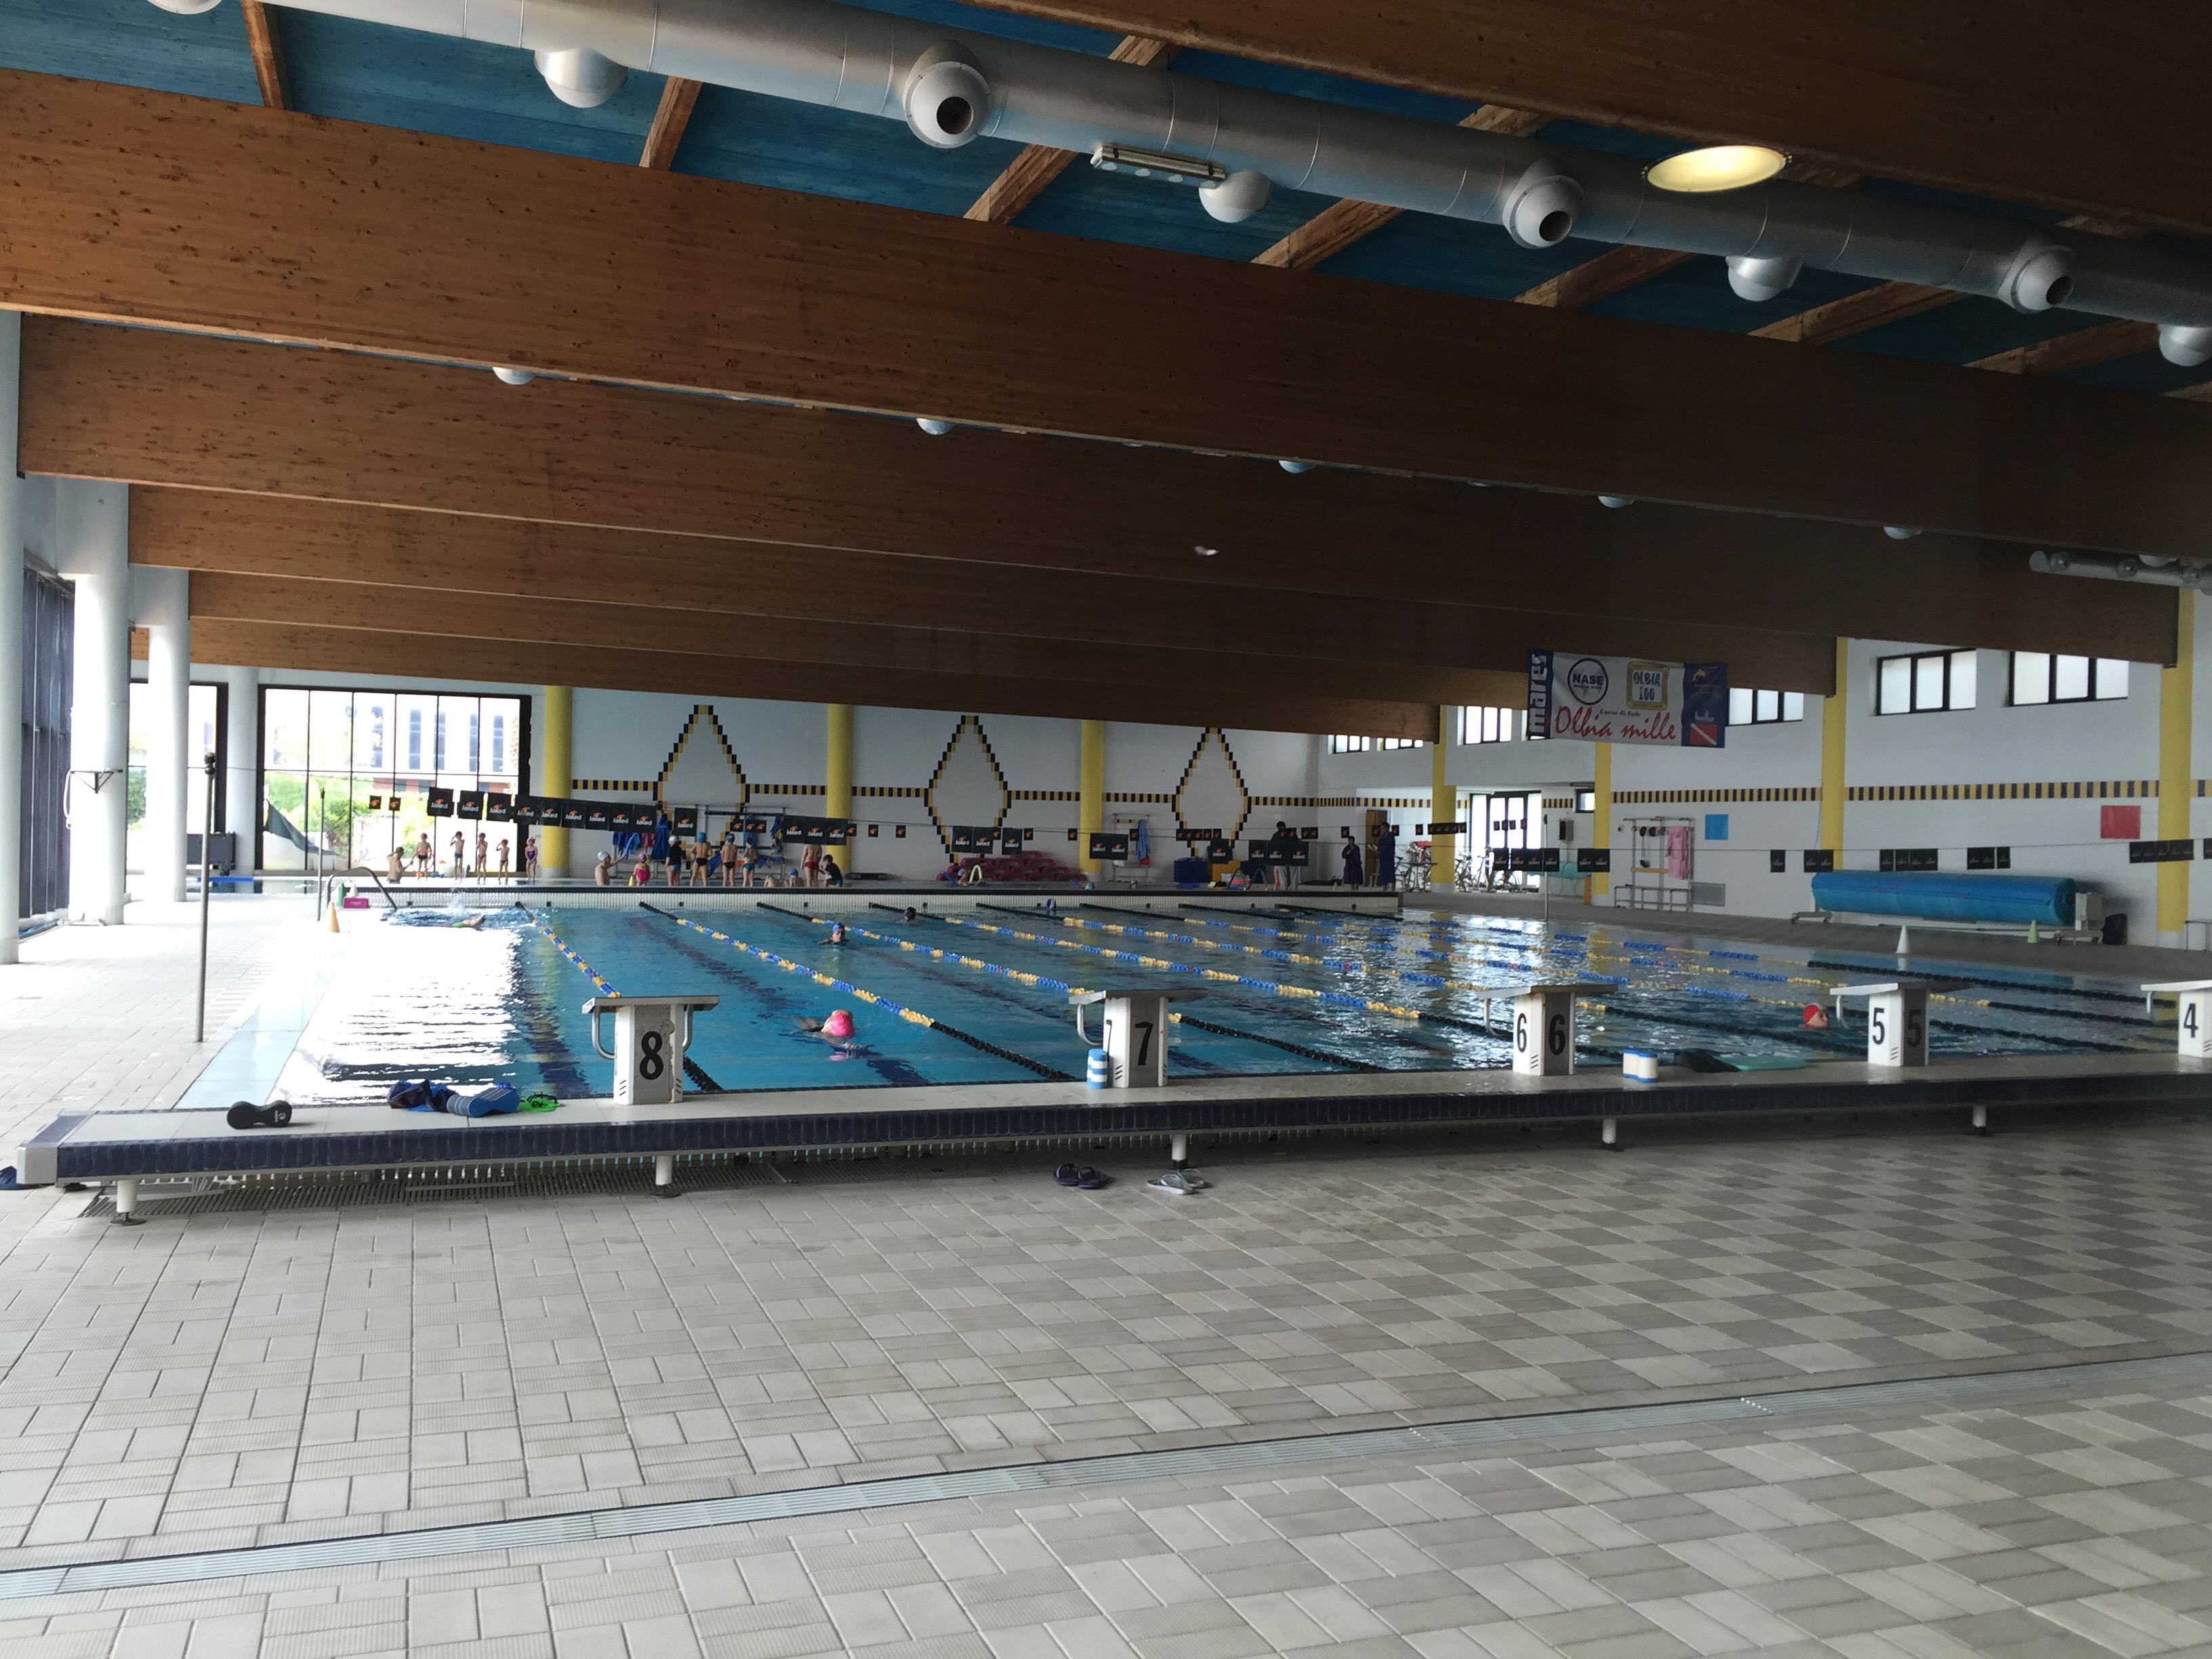 25-meter indoor swimming pool at Geo Village | Olbia, Sardinia | BrowsingItaly.com